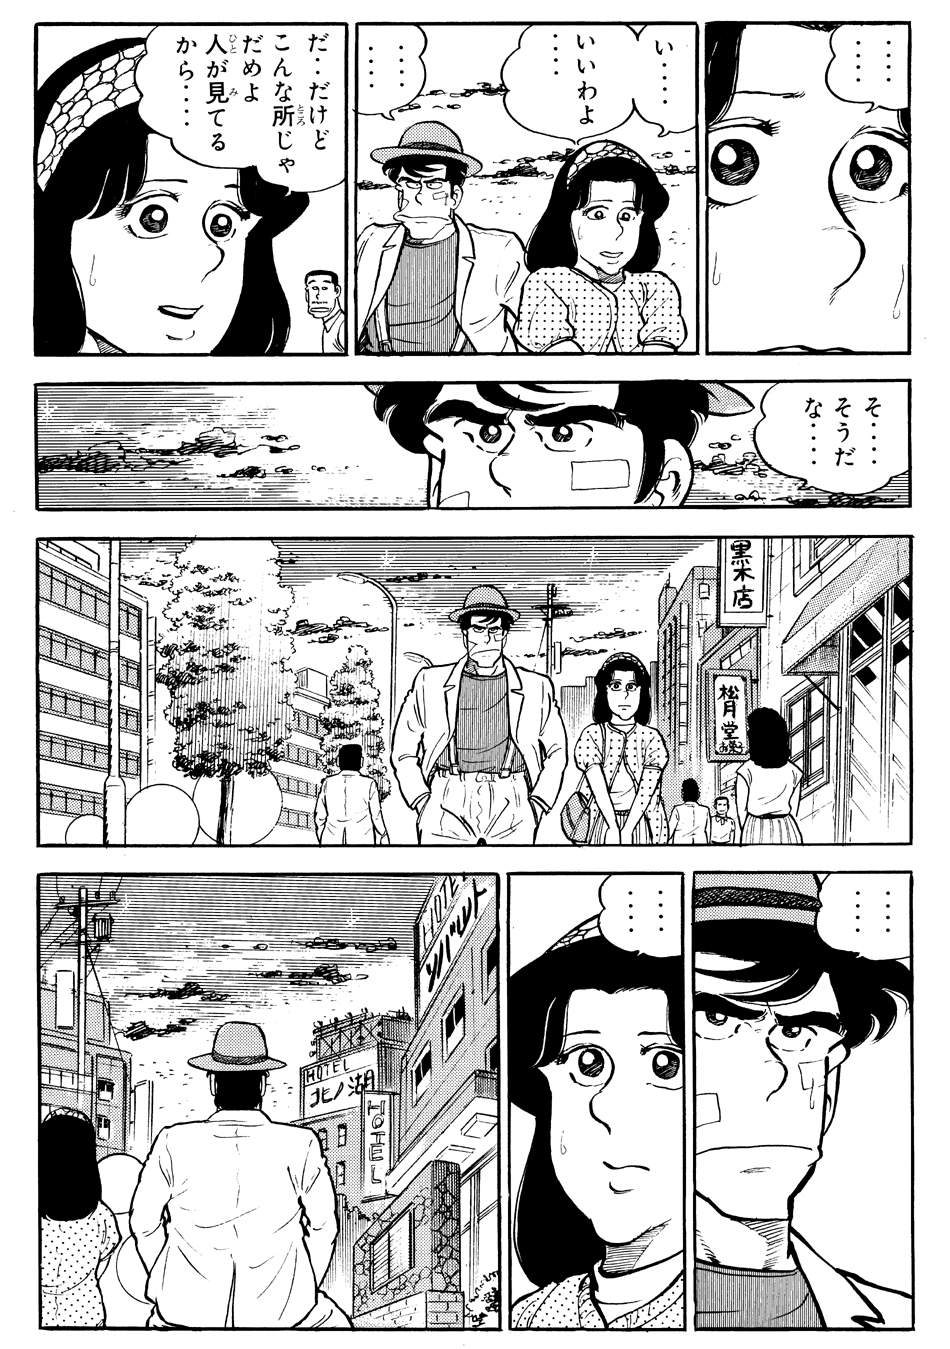 sanshiro_20